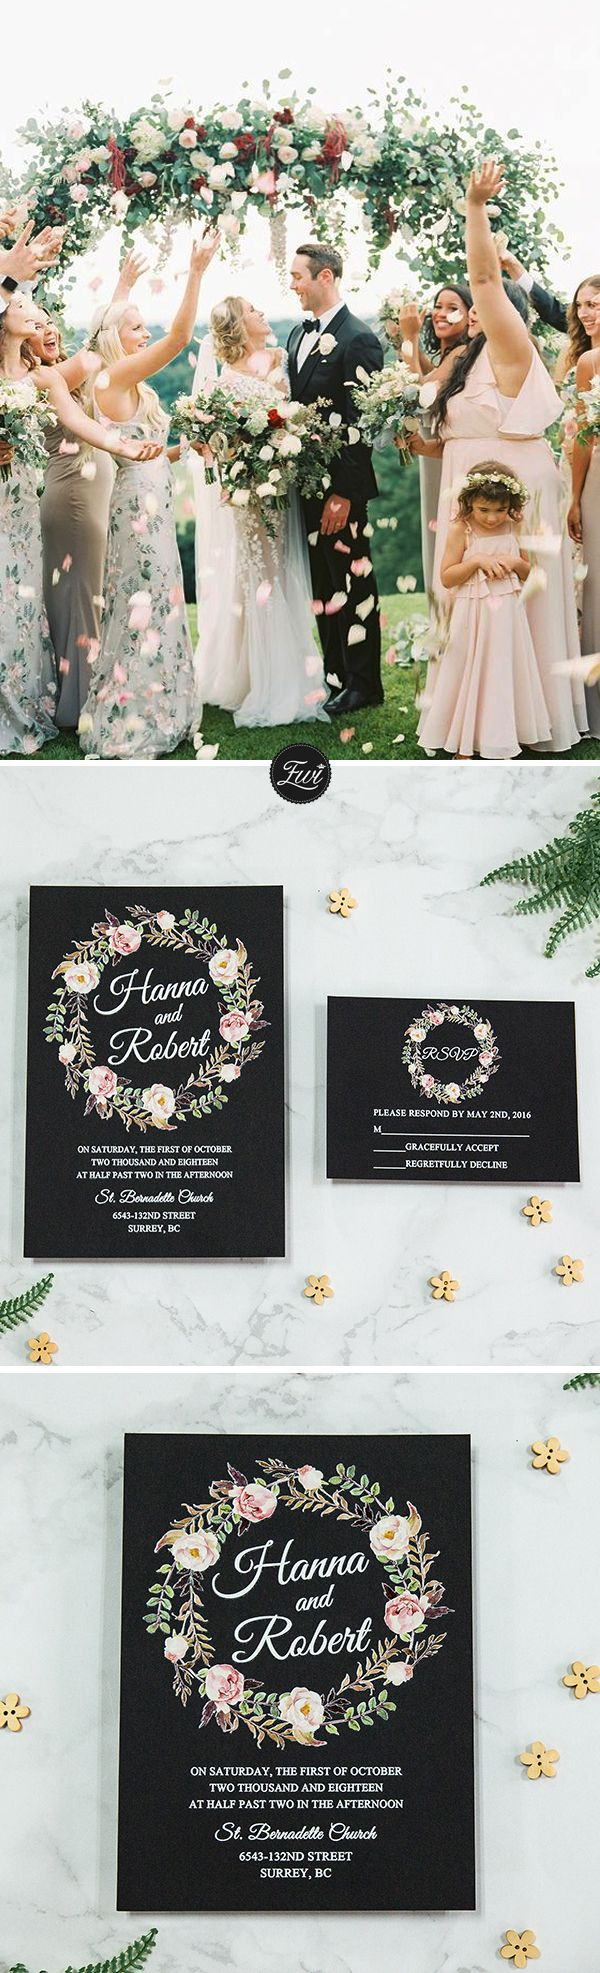 284 best Wedding Invitations images on Pinterest